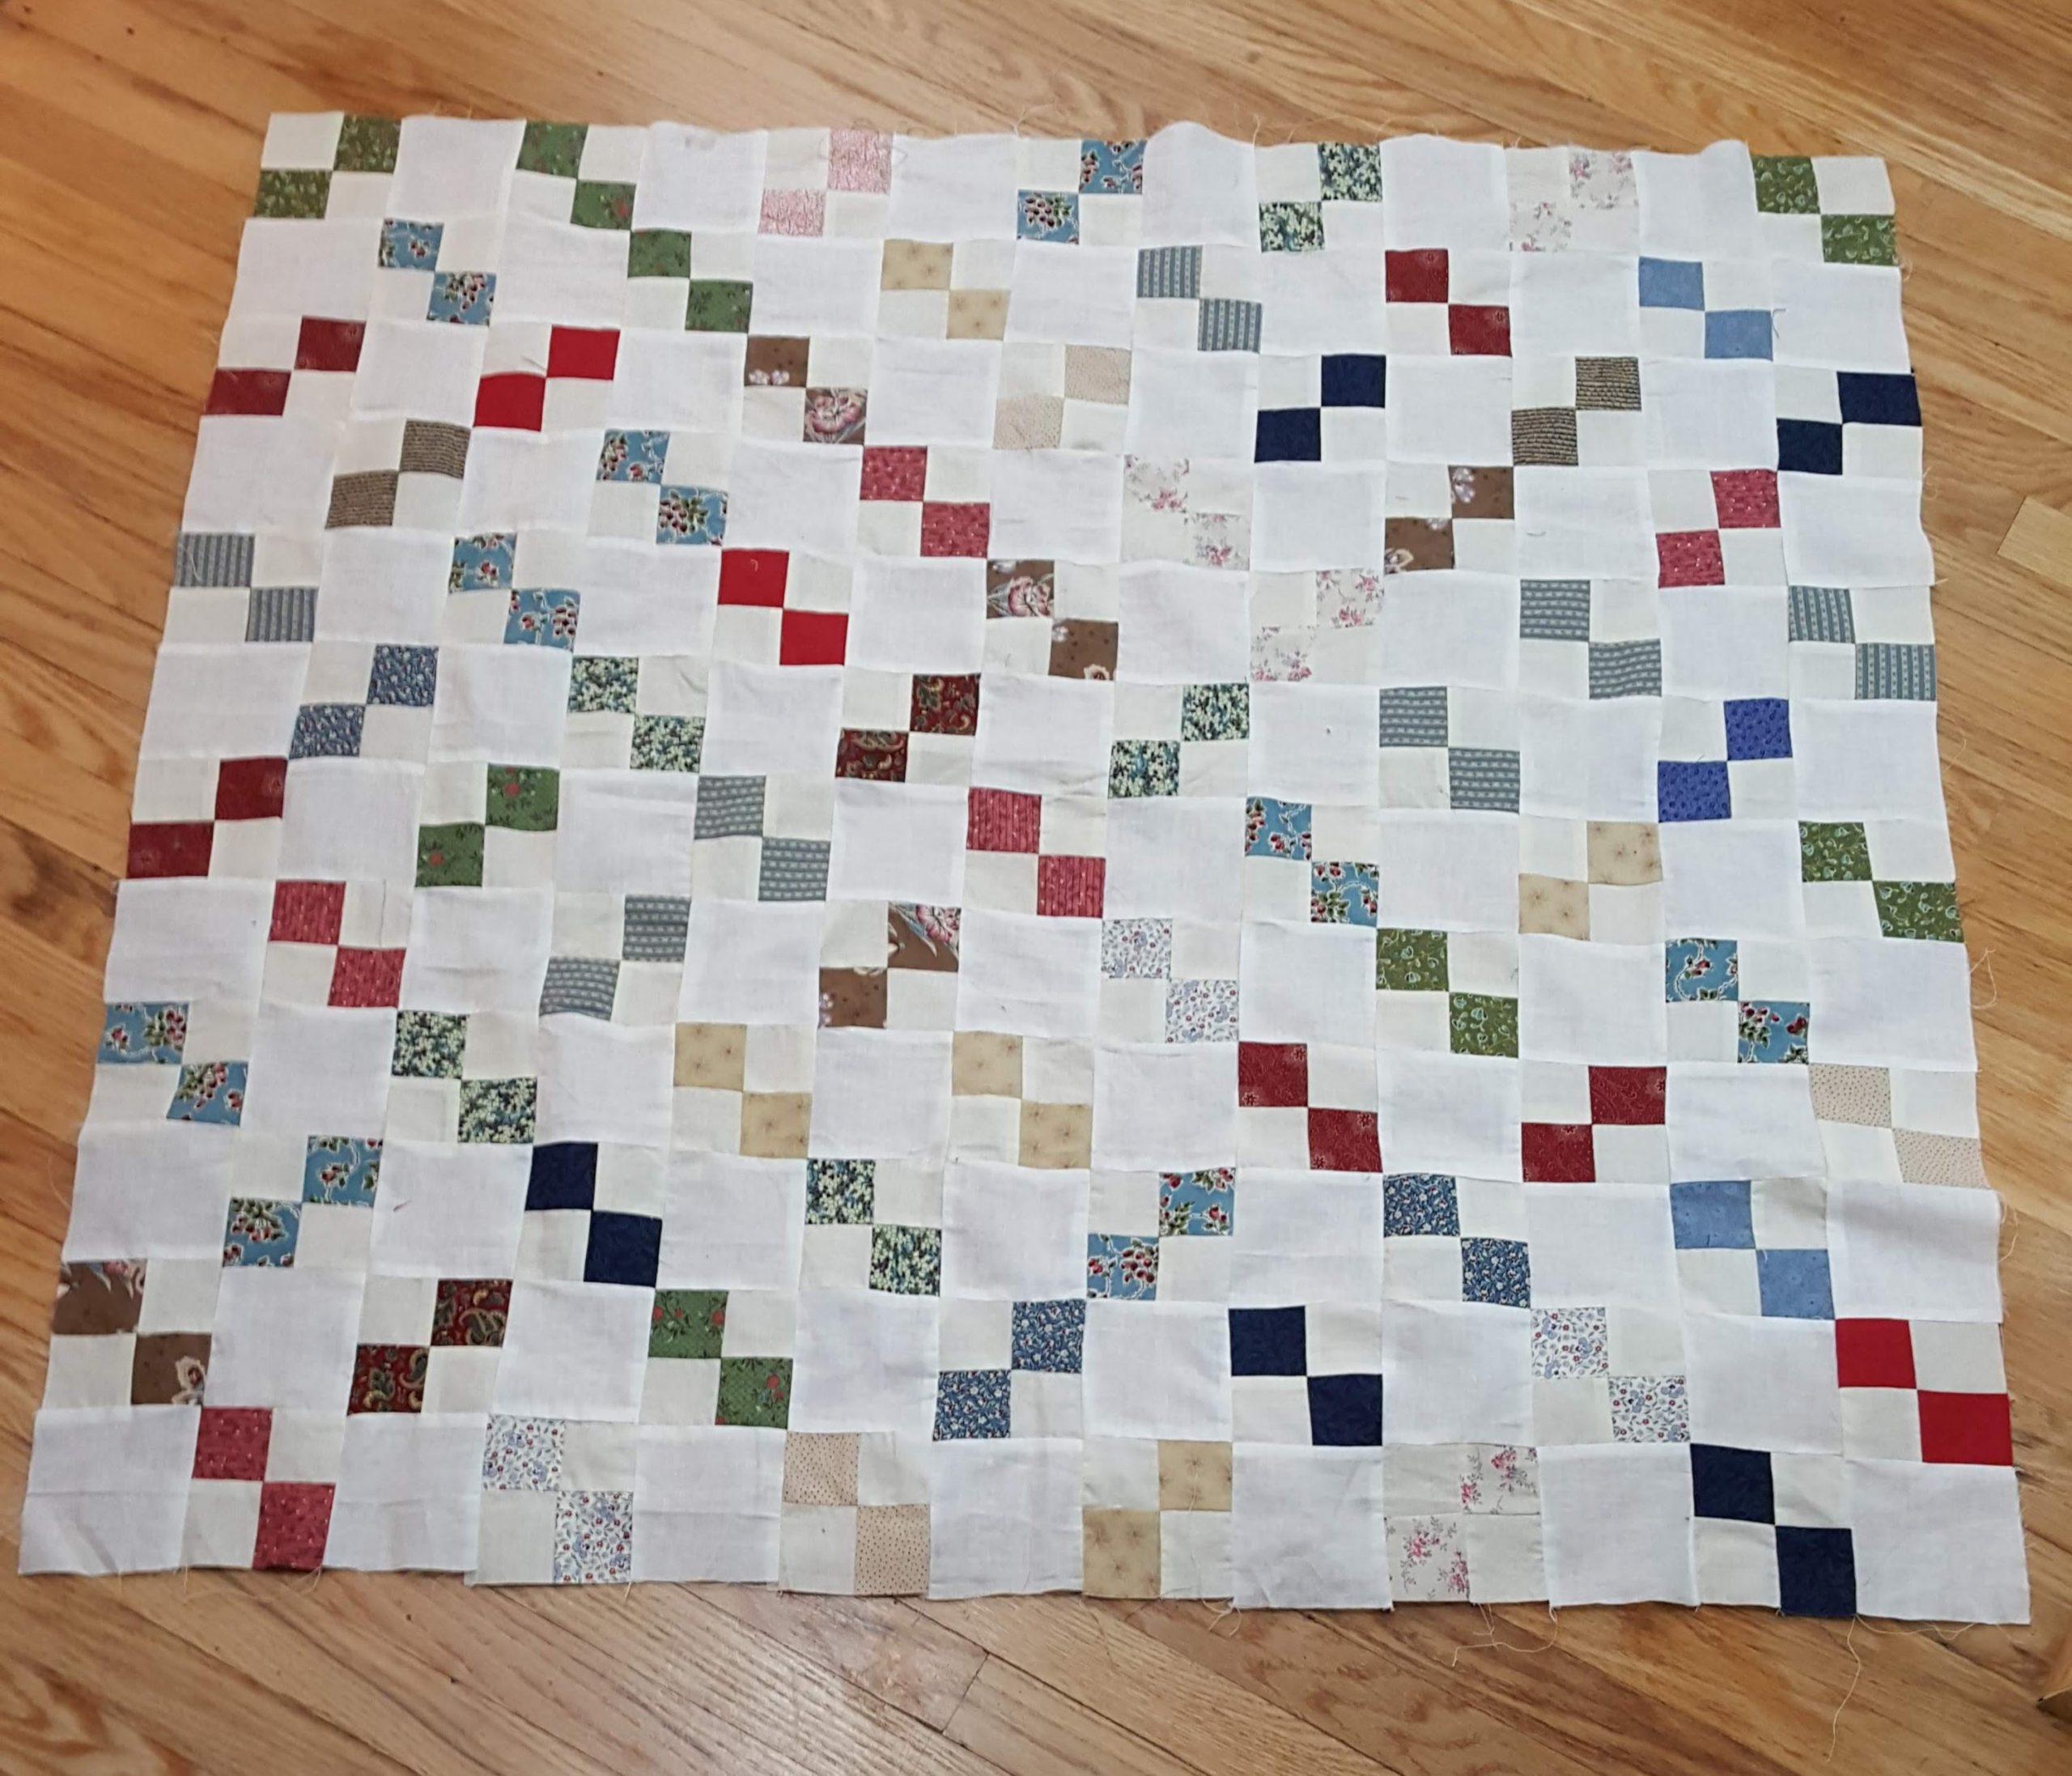 4 patch quilt top